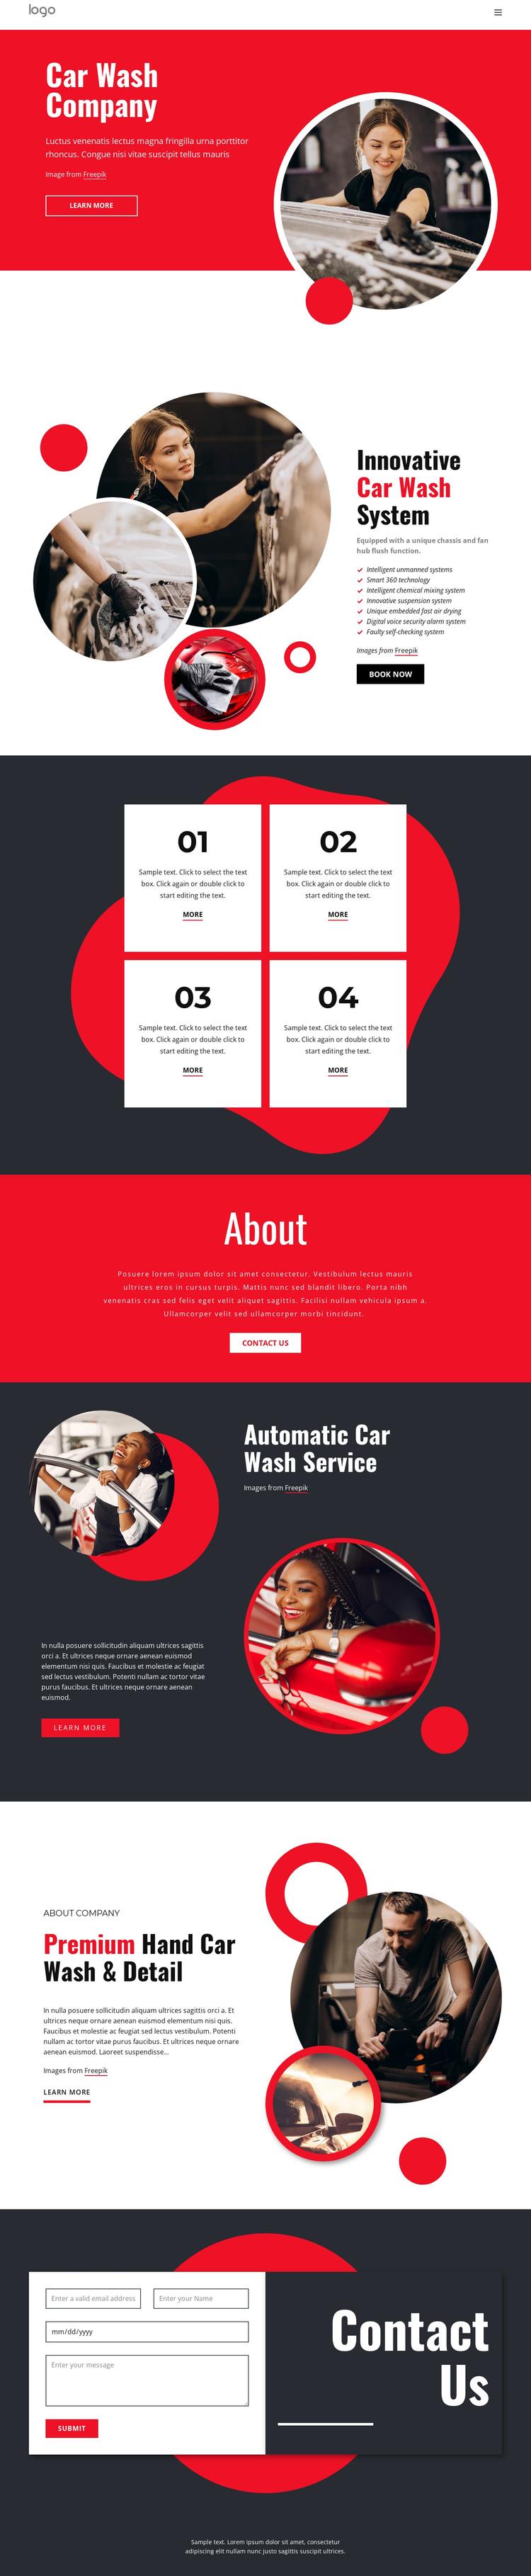 Ecologically friendly car washing Website Builder Software